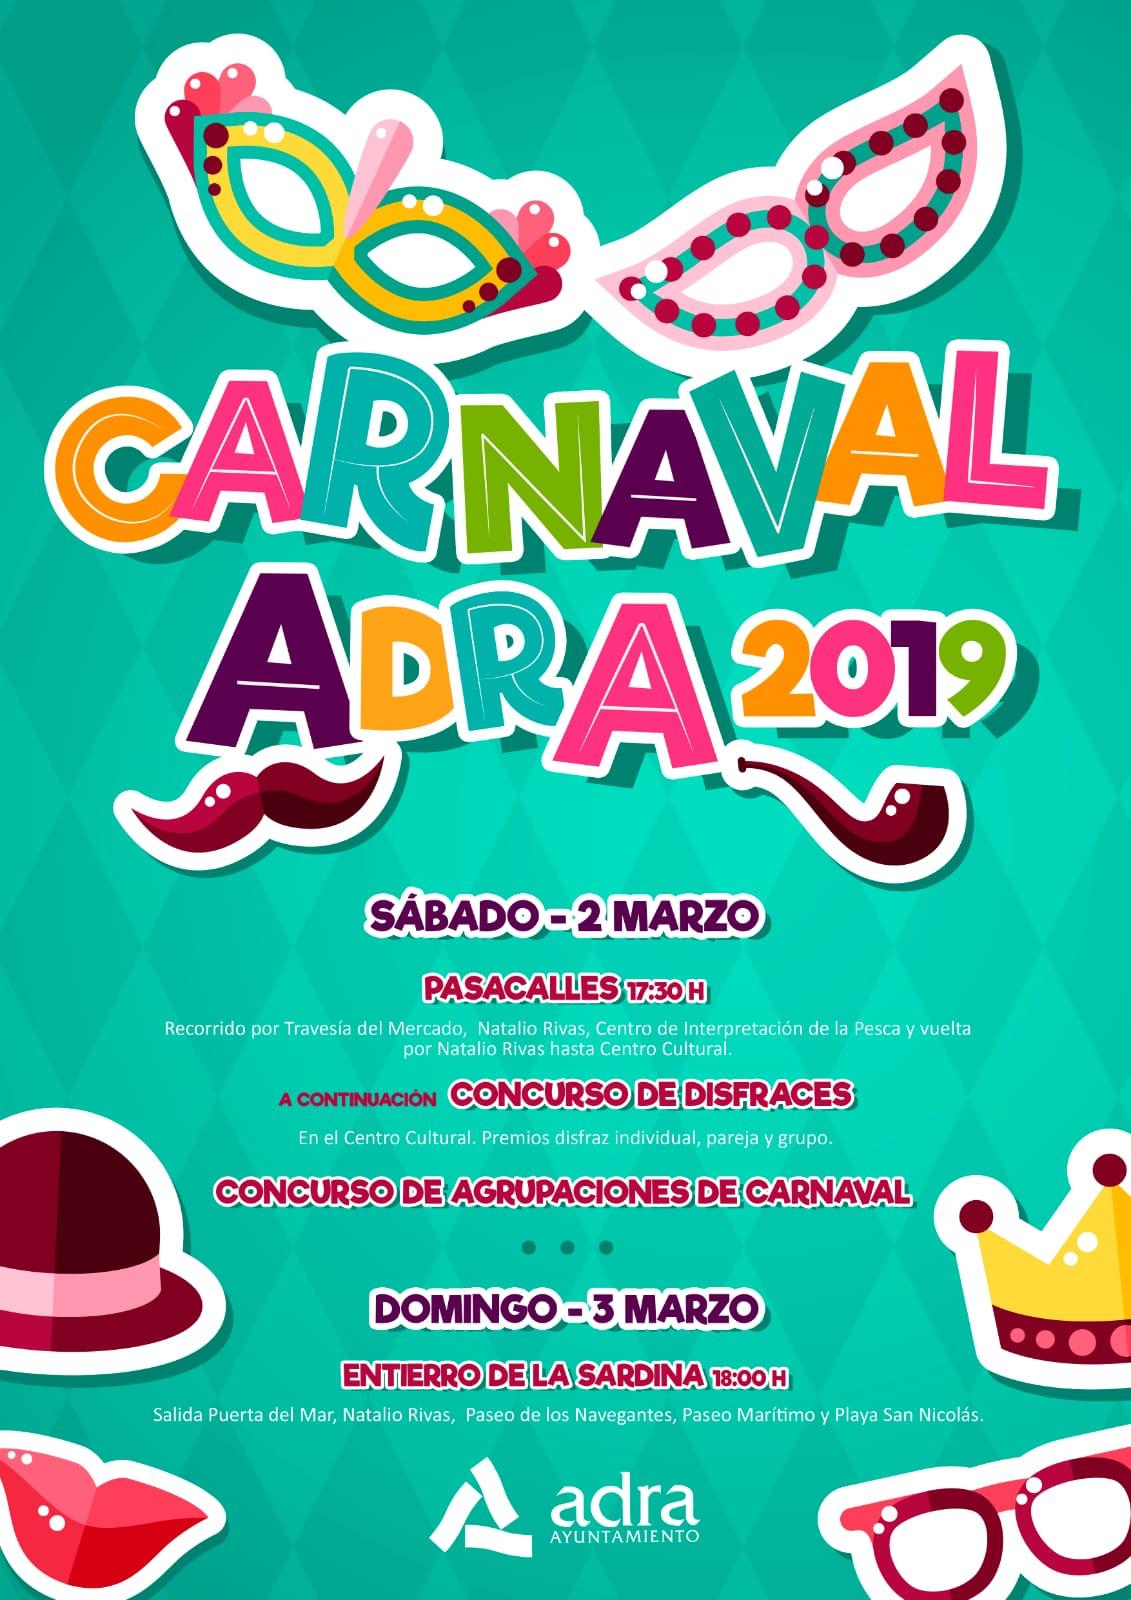 Cartel Carnaval de Adra 2019